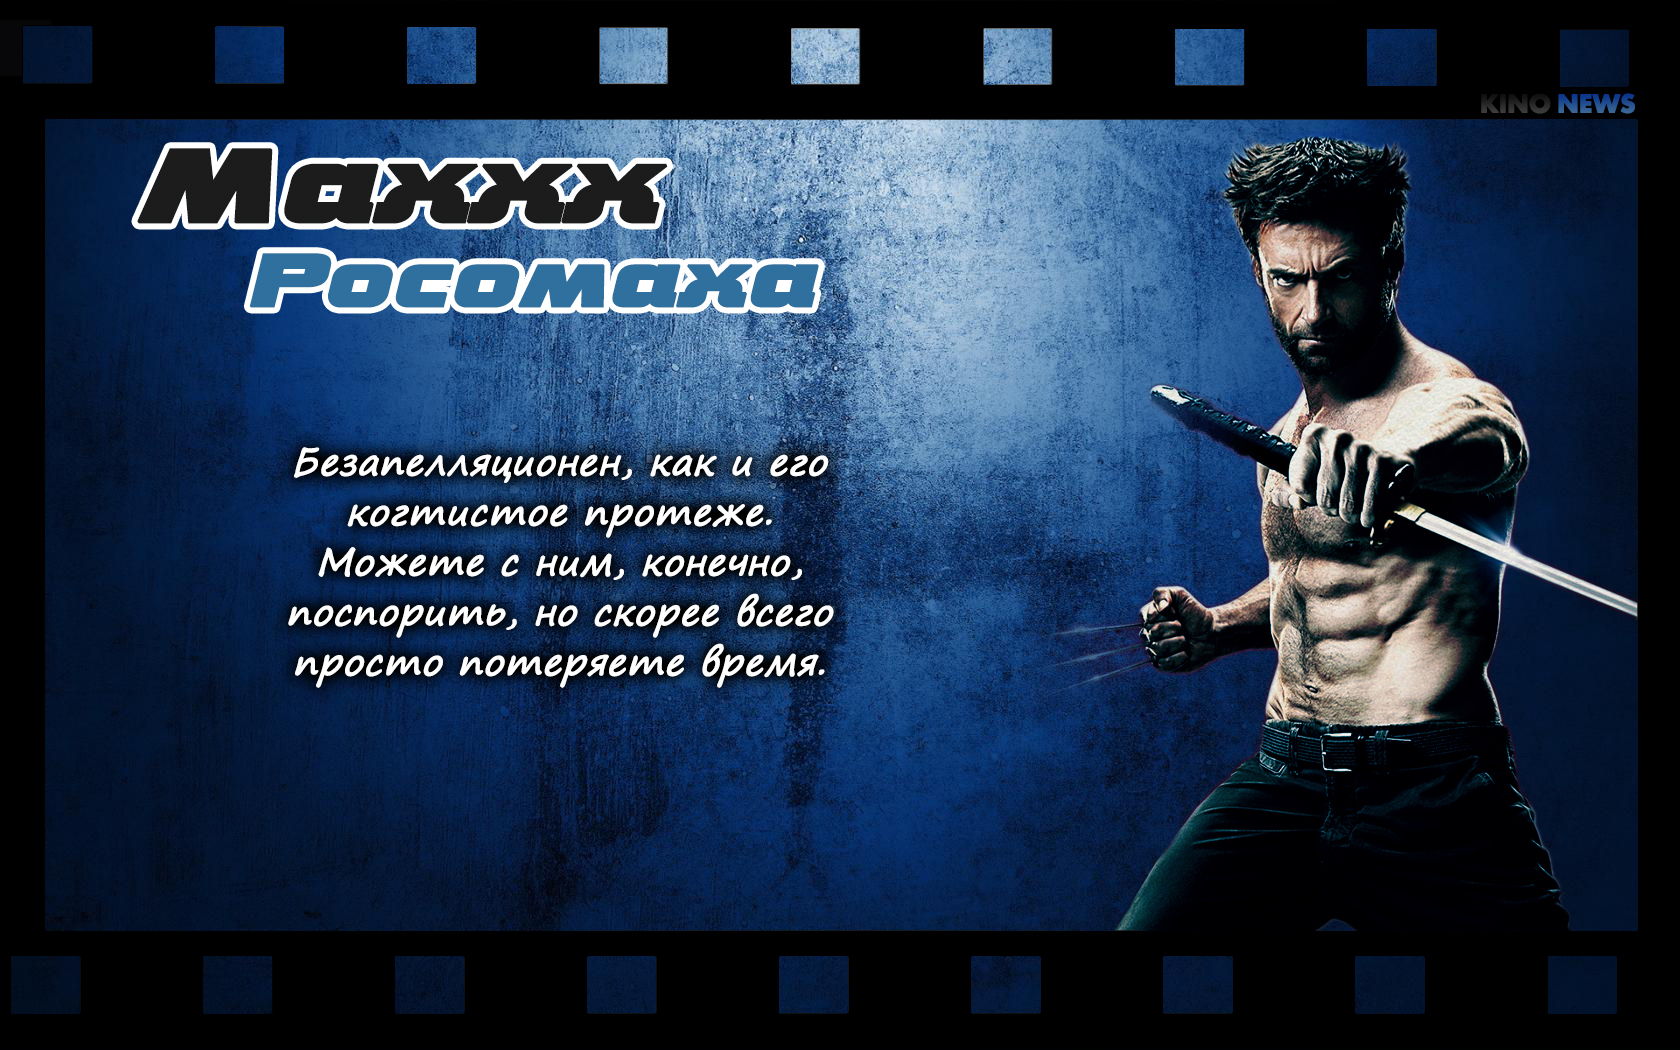 https://www.kinonews.ru/insimgs/2017/persimg/persimg77944_46.jpg